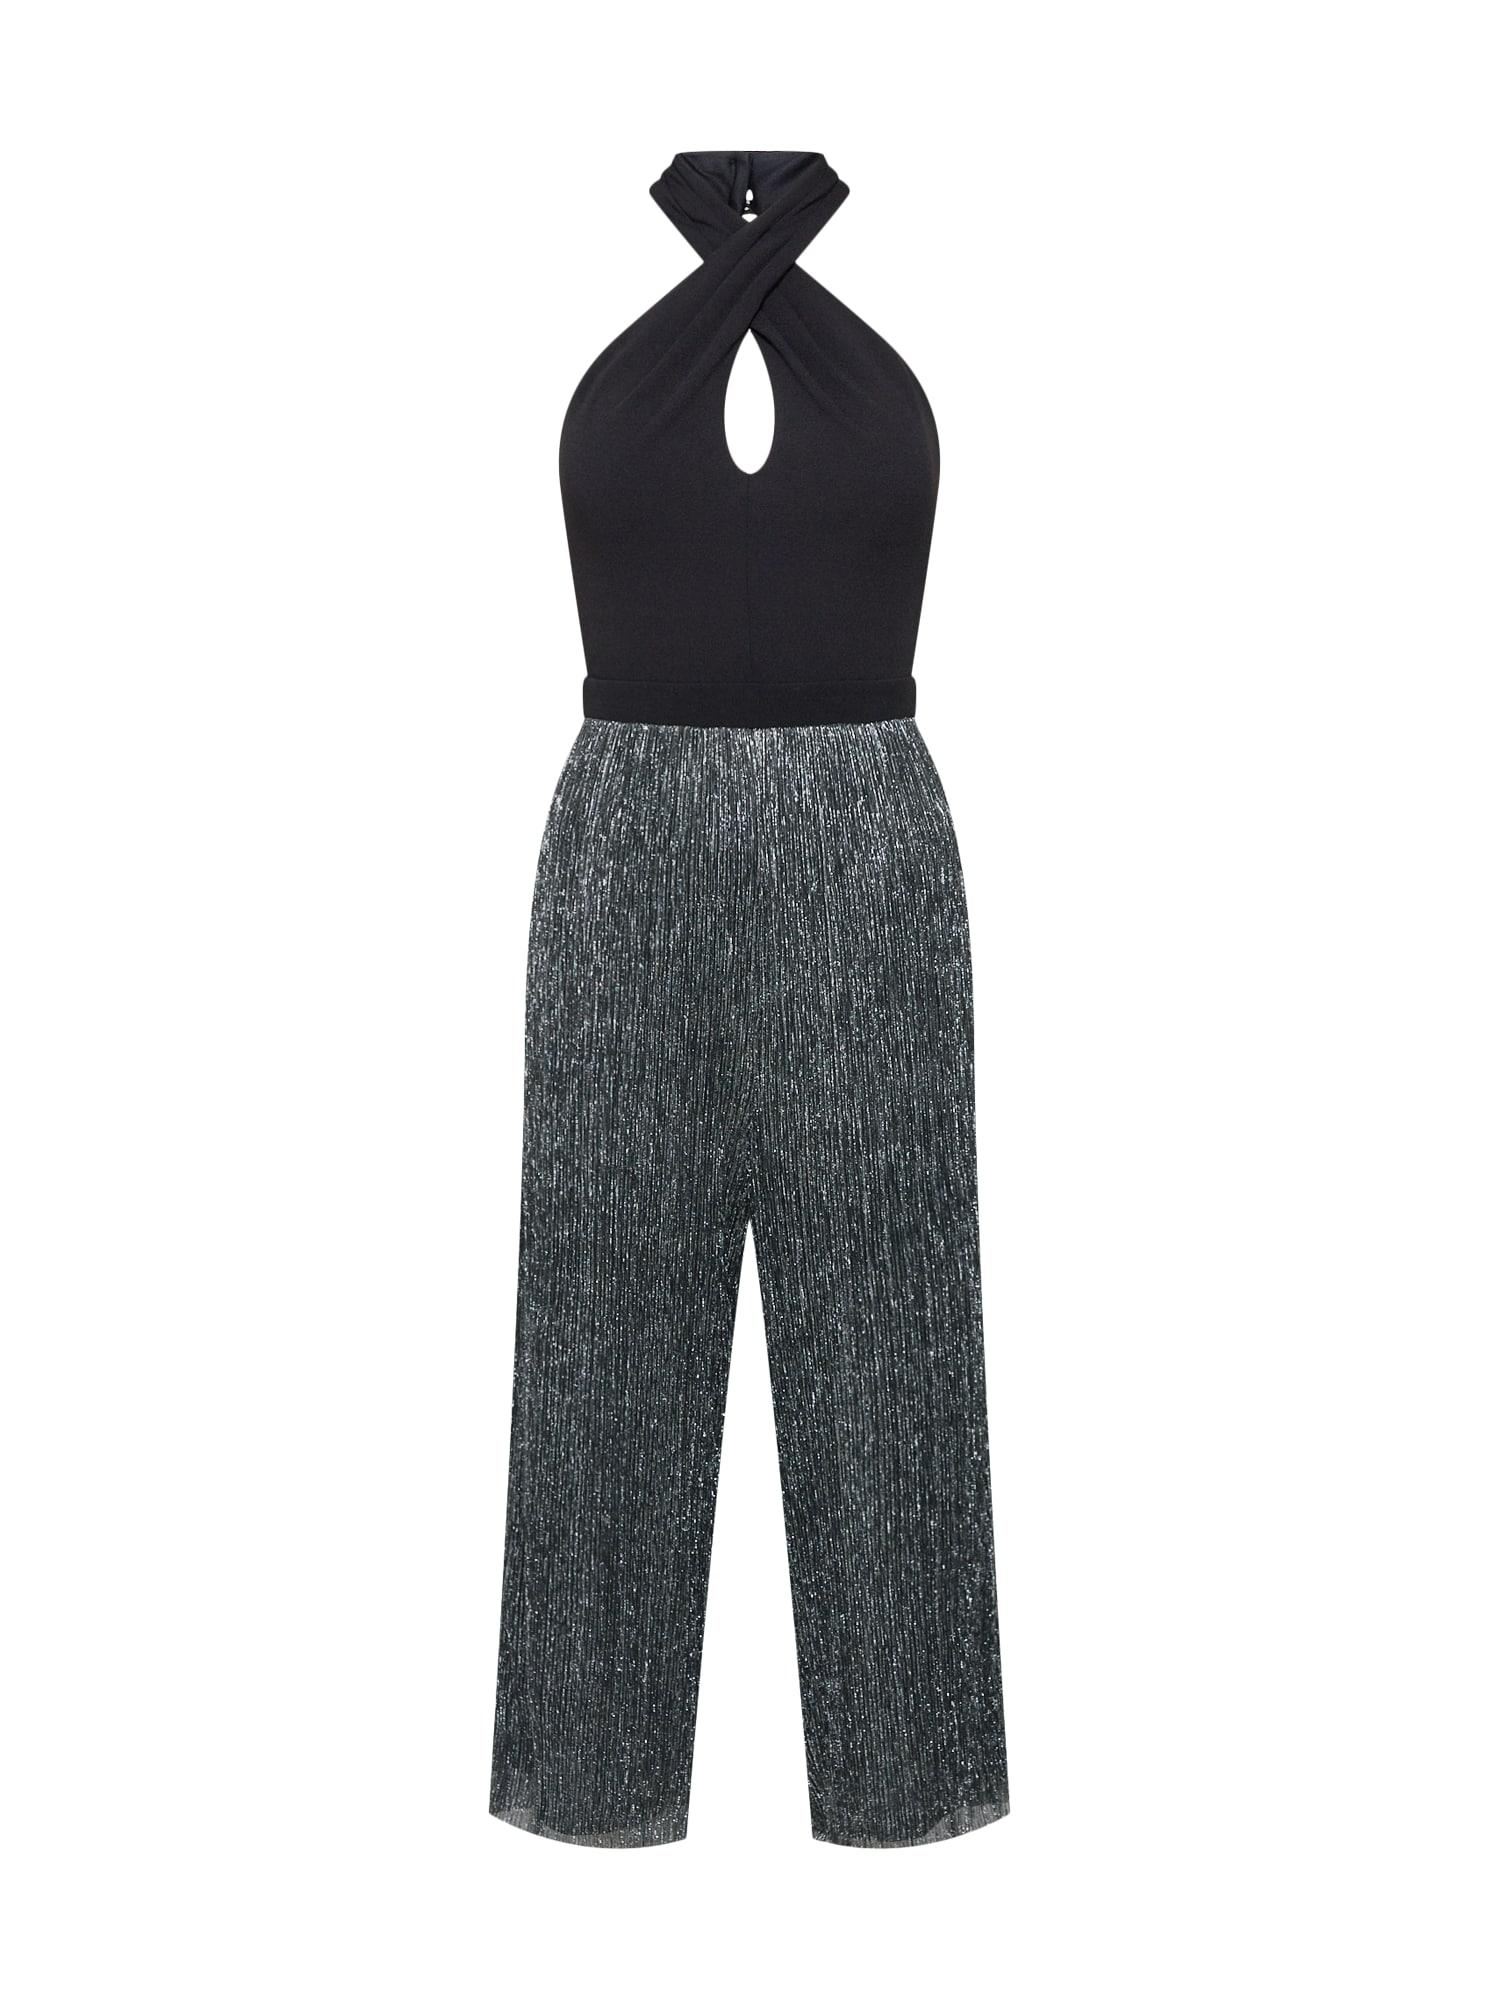 Lipsy, Dames Jumpsuit 'BLACK/SILVER HALTER JUMPSUIT', zwart